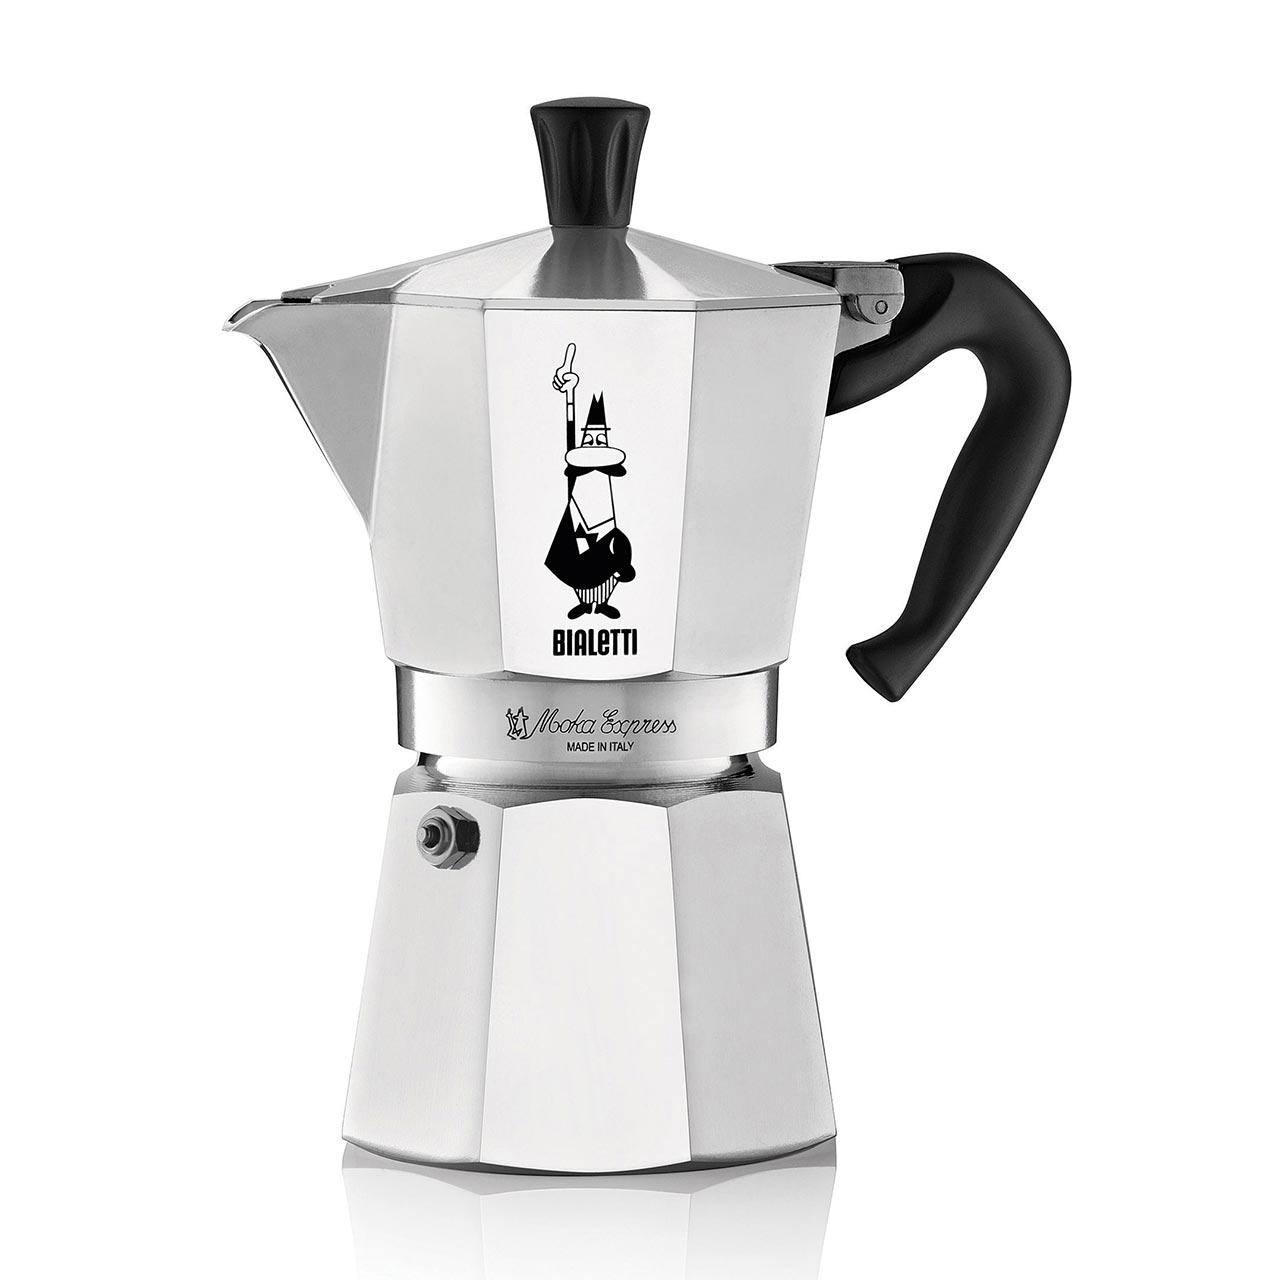 BIALETTI Moka Express 4 Cup Espresso Maker